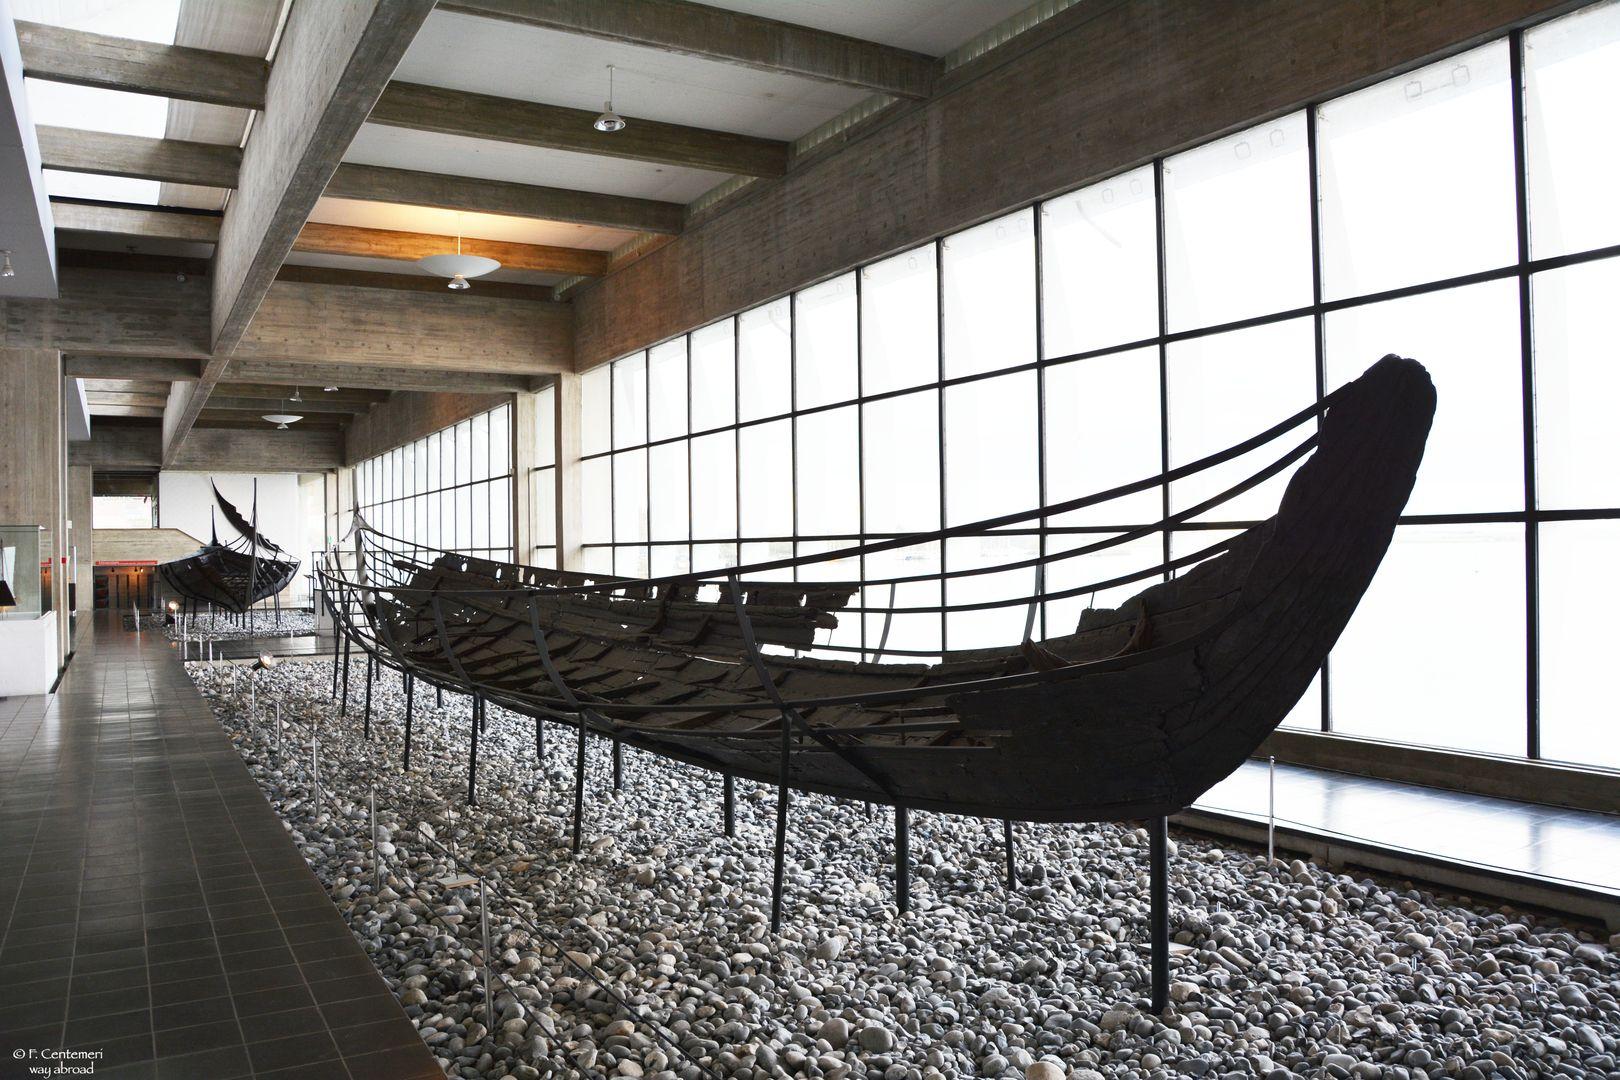 Sala delle navi vichinghe